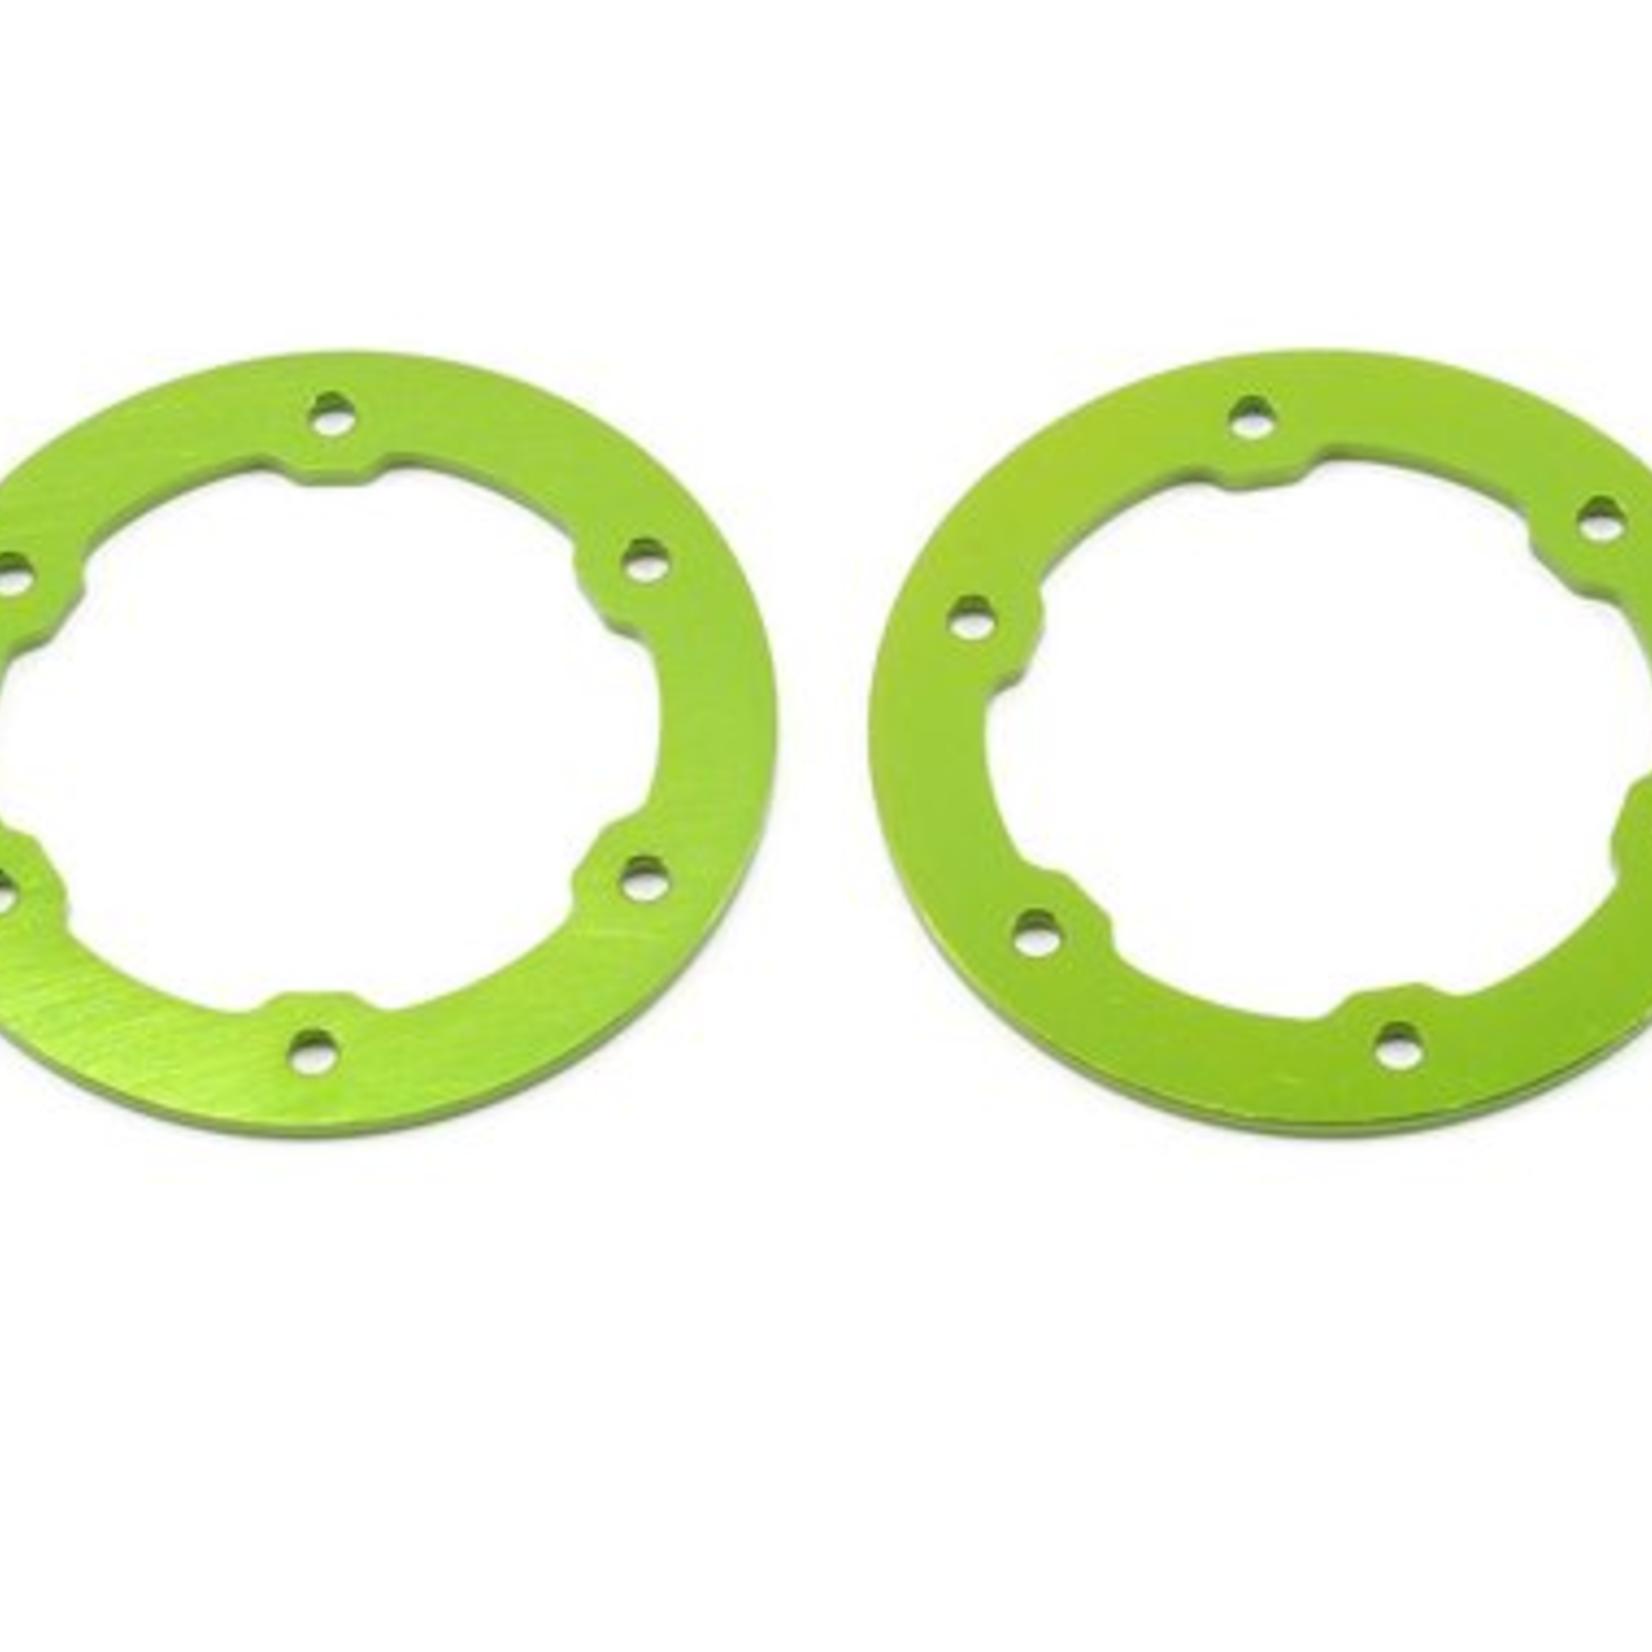 ST Racing Concepts SPTSTP6236G ST Racing Concepts Aluminum Lightweight Beadlock Ring (Green)